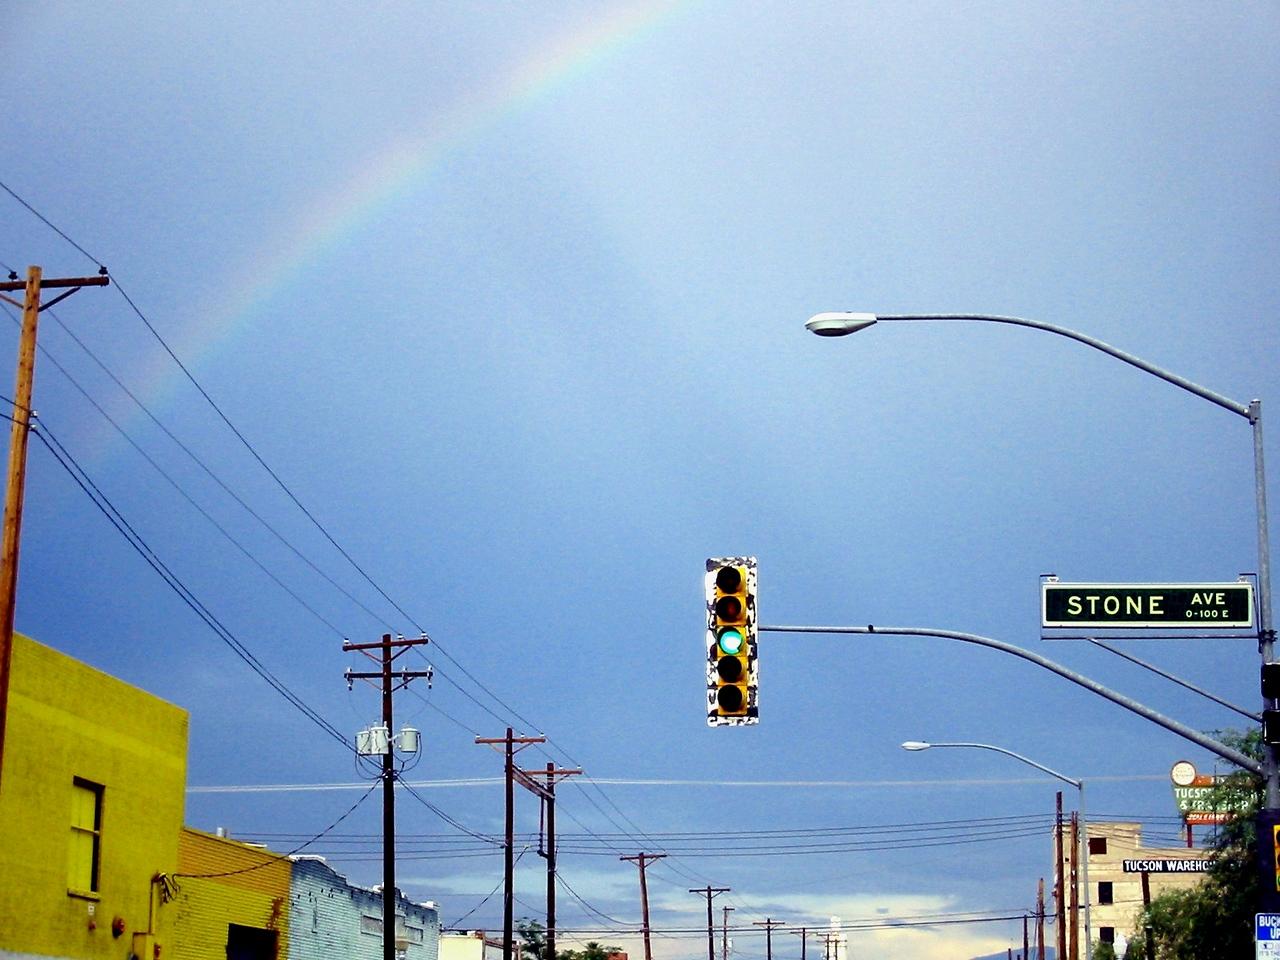 Tucson, August 2002